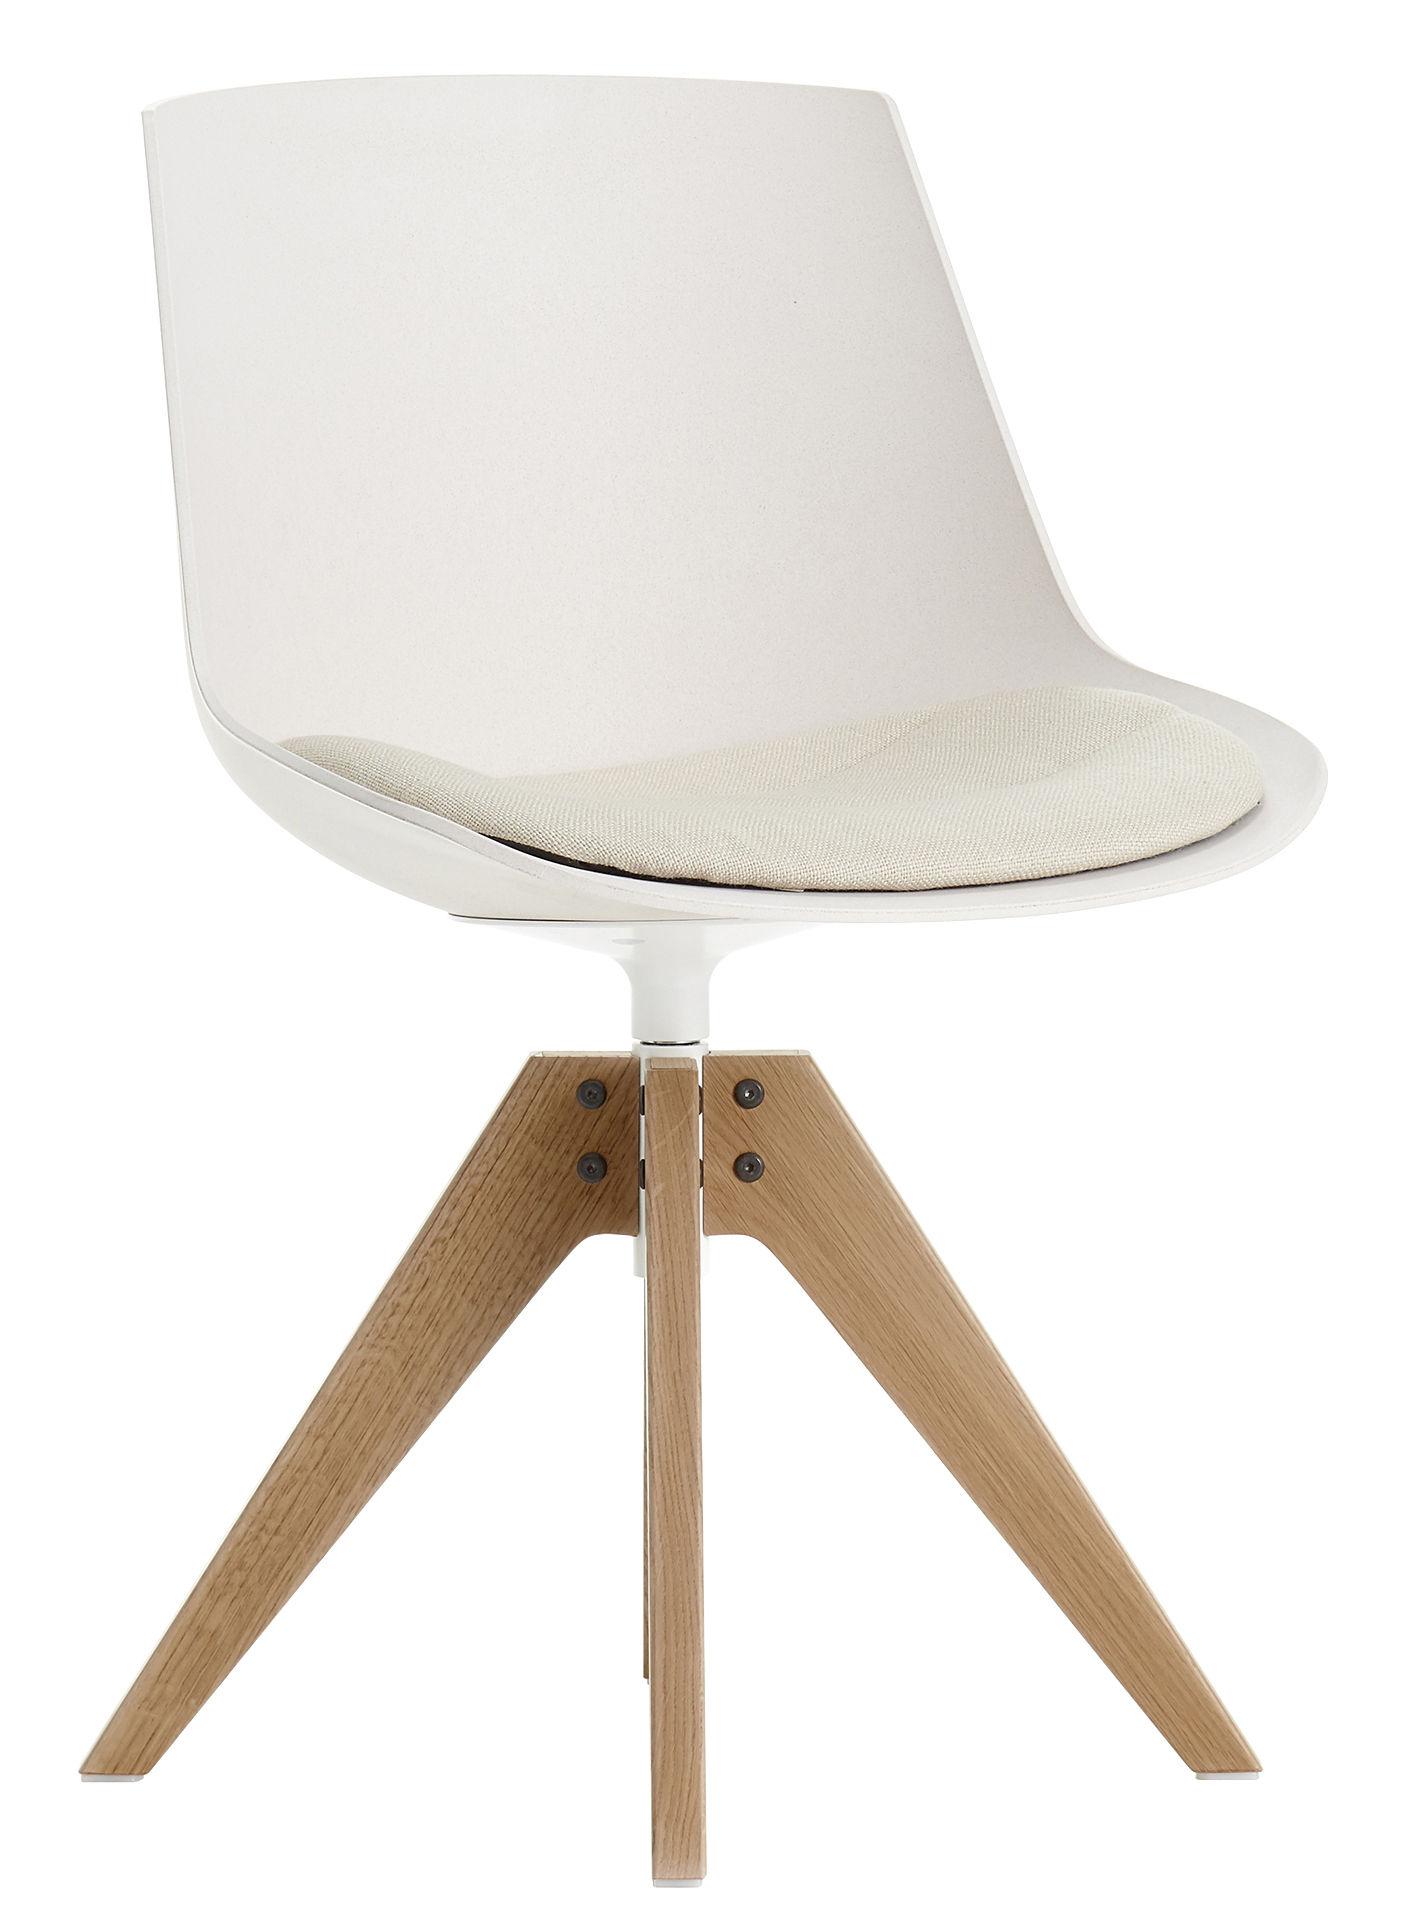 Furniture - Chairs - Flow ECO Swivel chair - / Seat cushion - 4 VN oak feet by MDF Italia - White / Light oak feet - Agglomerated beech fibres, Fabric, Foam, Solid oak